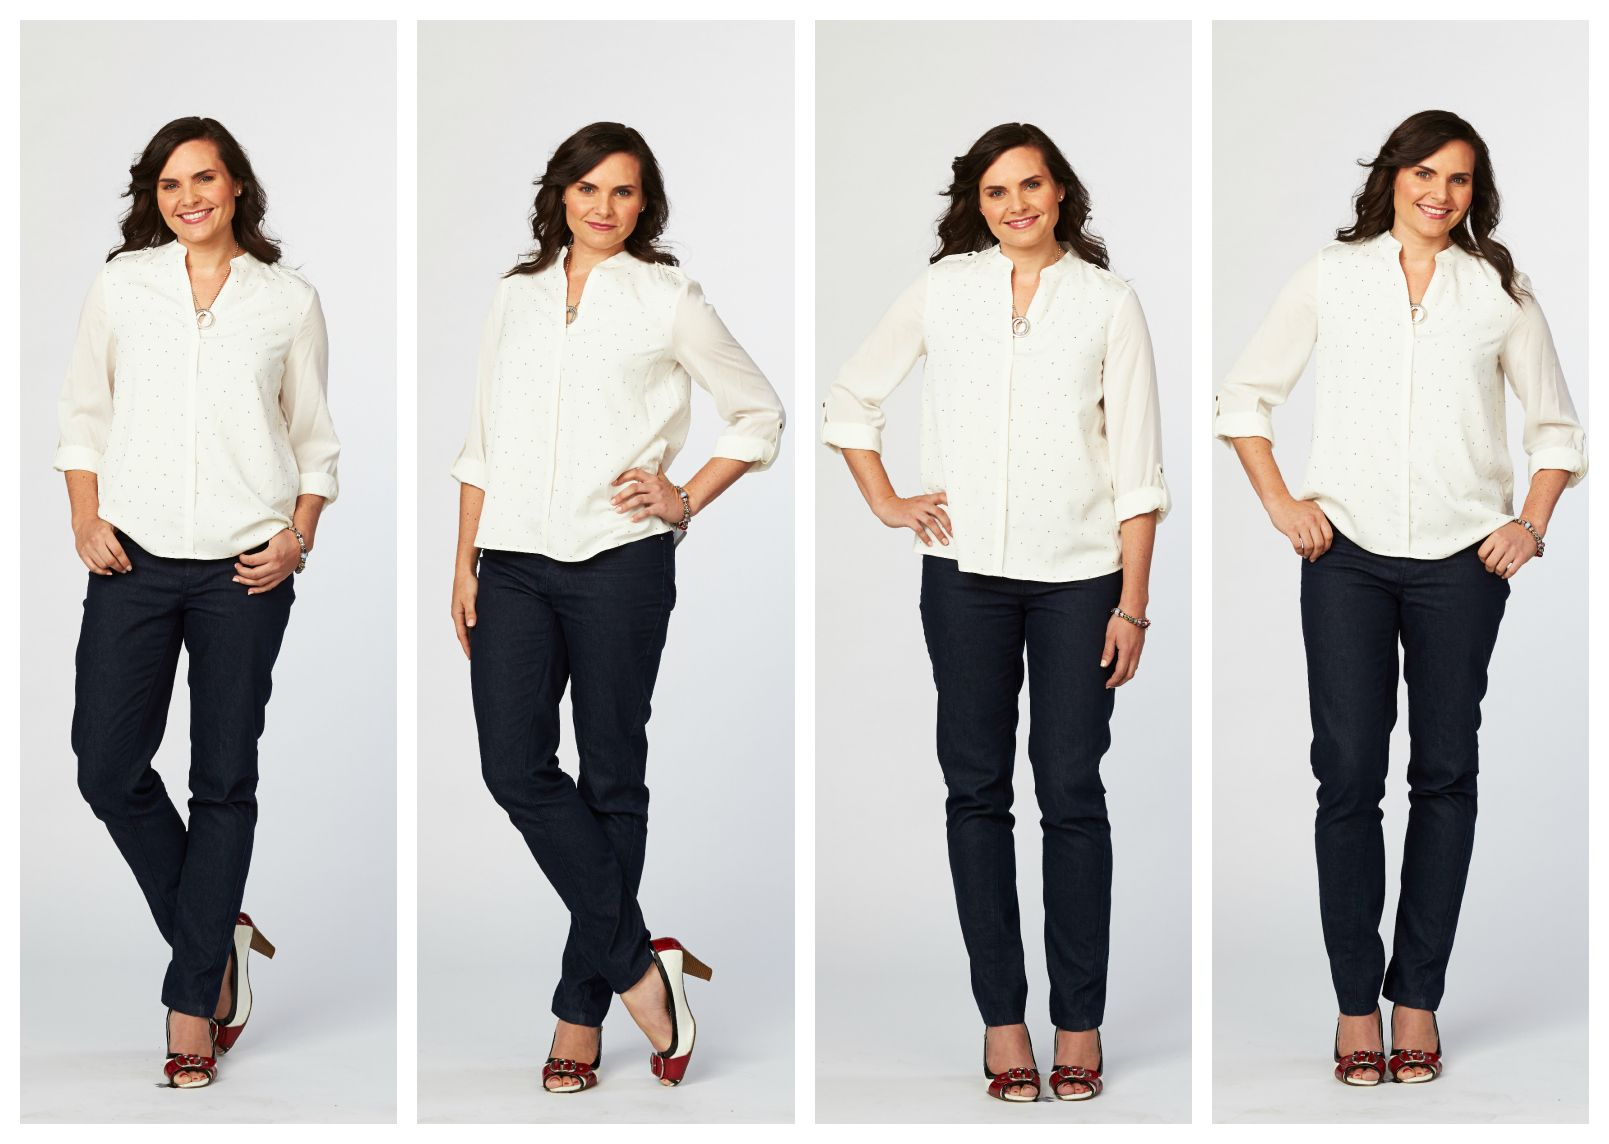 Jeans Liz Jordan Shoes Corelli From Williams Shirt